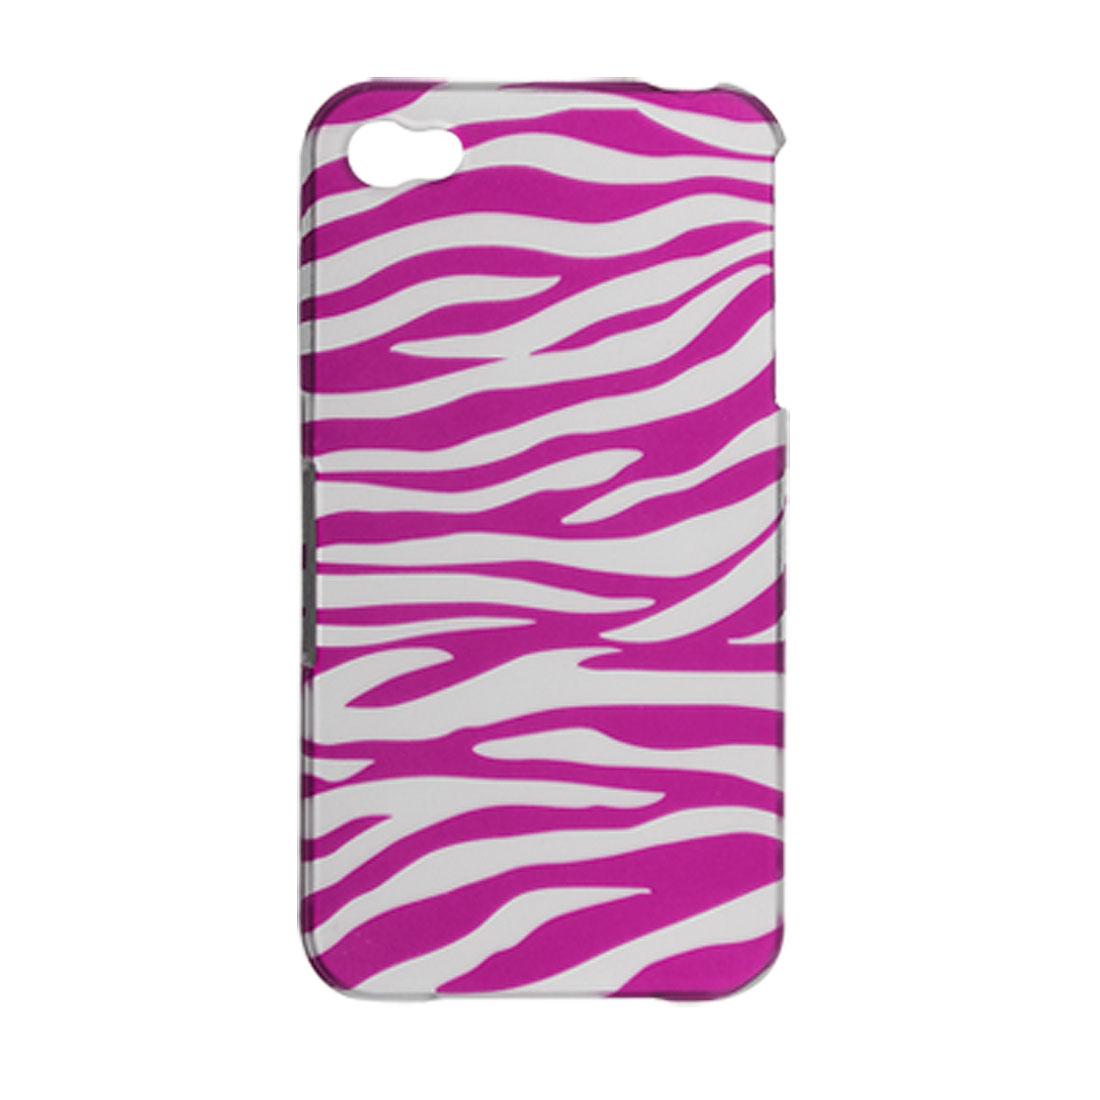 Fuchsia White Zebra Stripes Rubberized Plastic Case for iPhone 4 4G